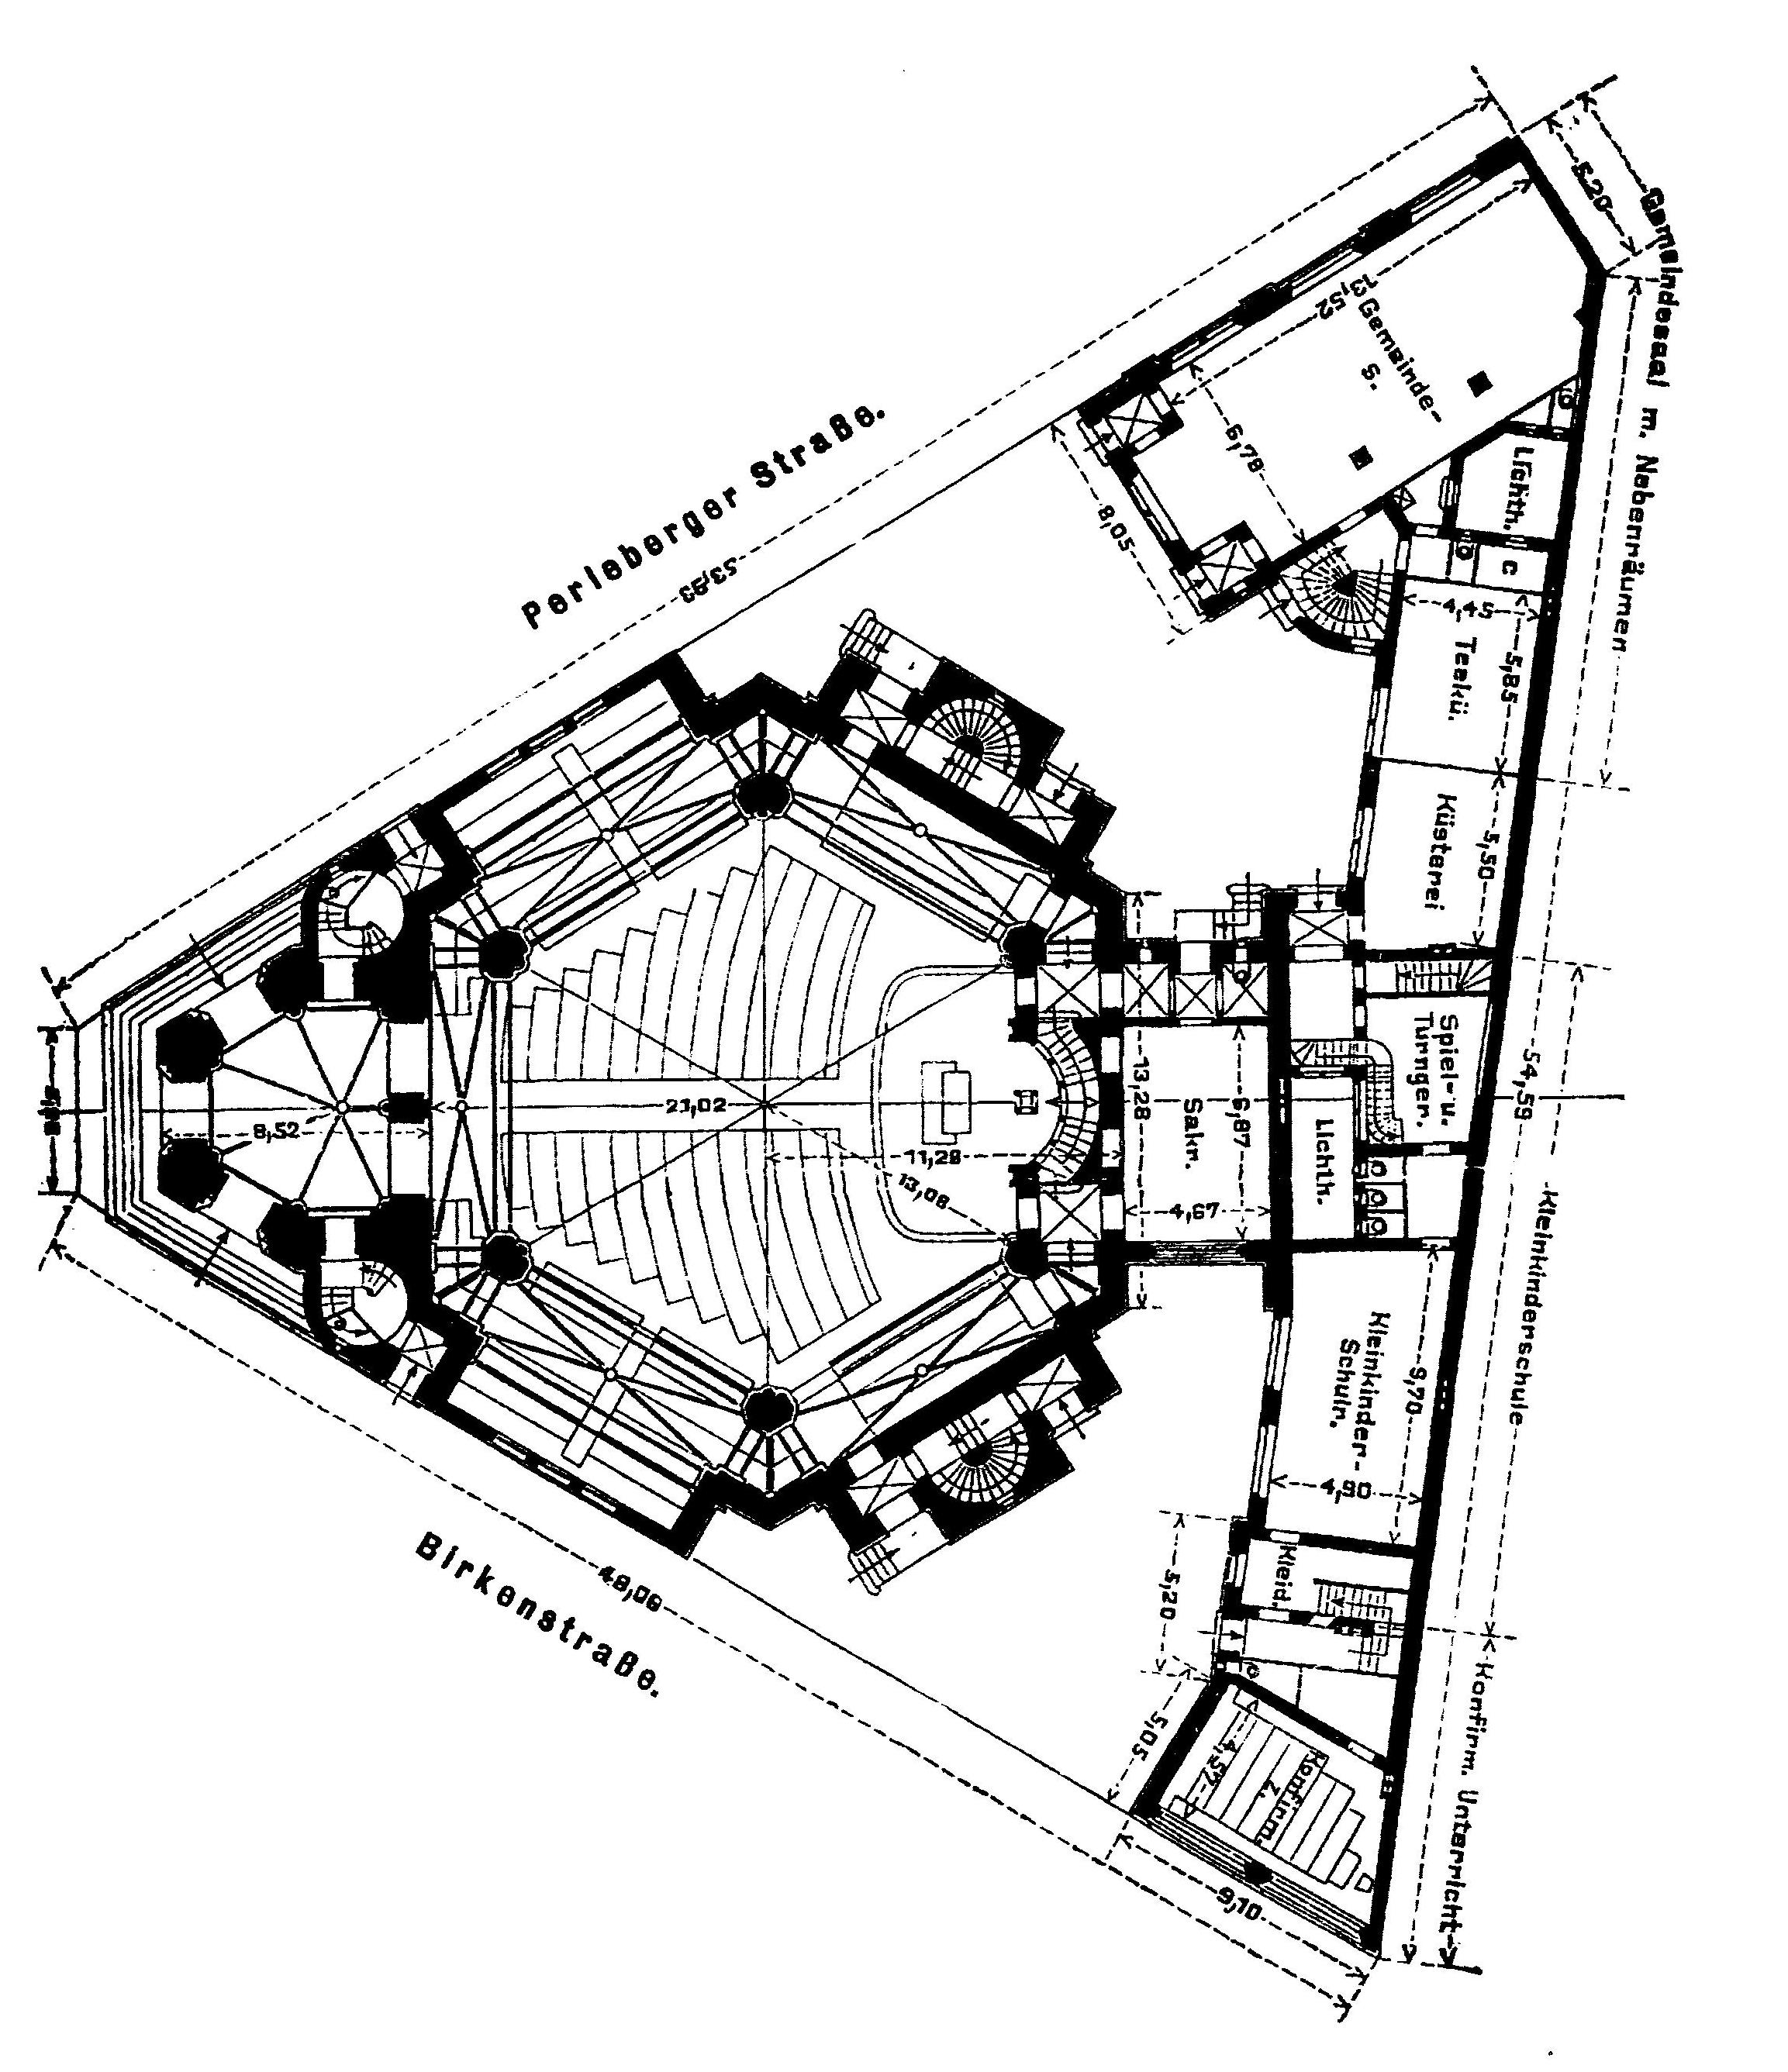 File:Heilig-Geist-Kirche Grundriss.jpg - Wikimedia Commons